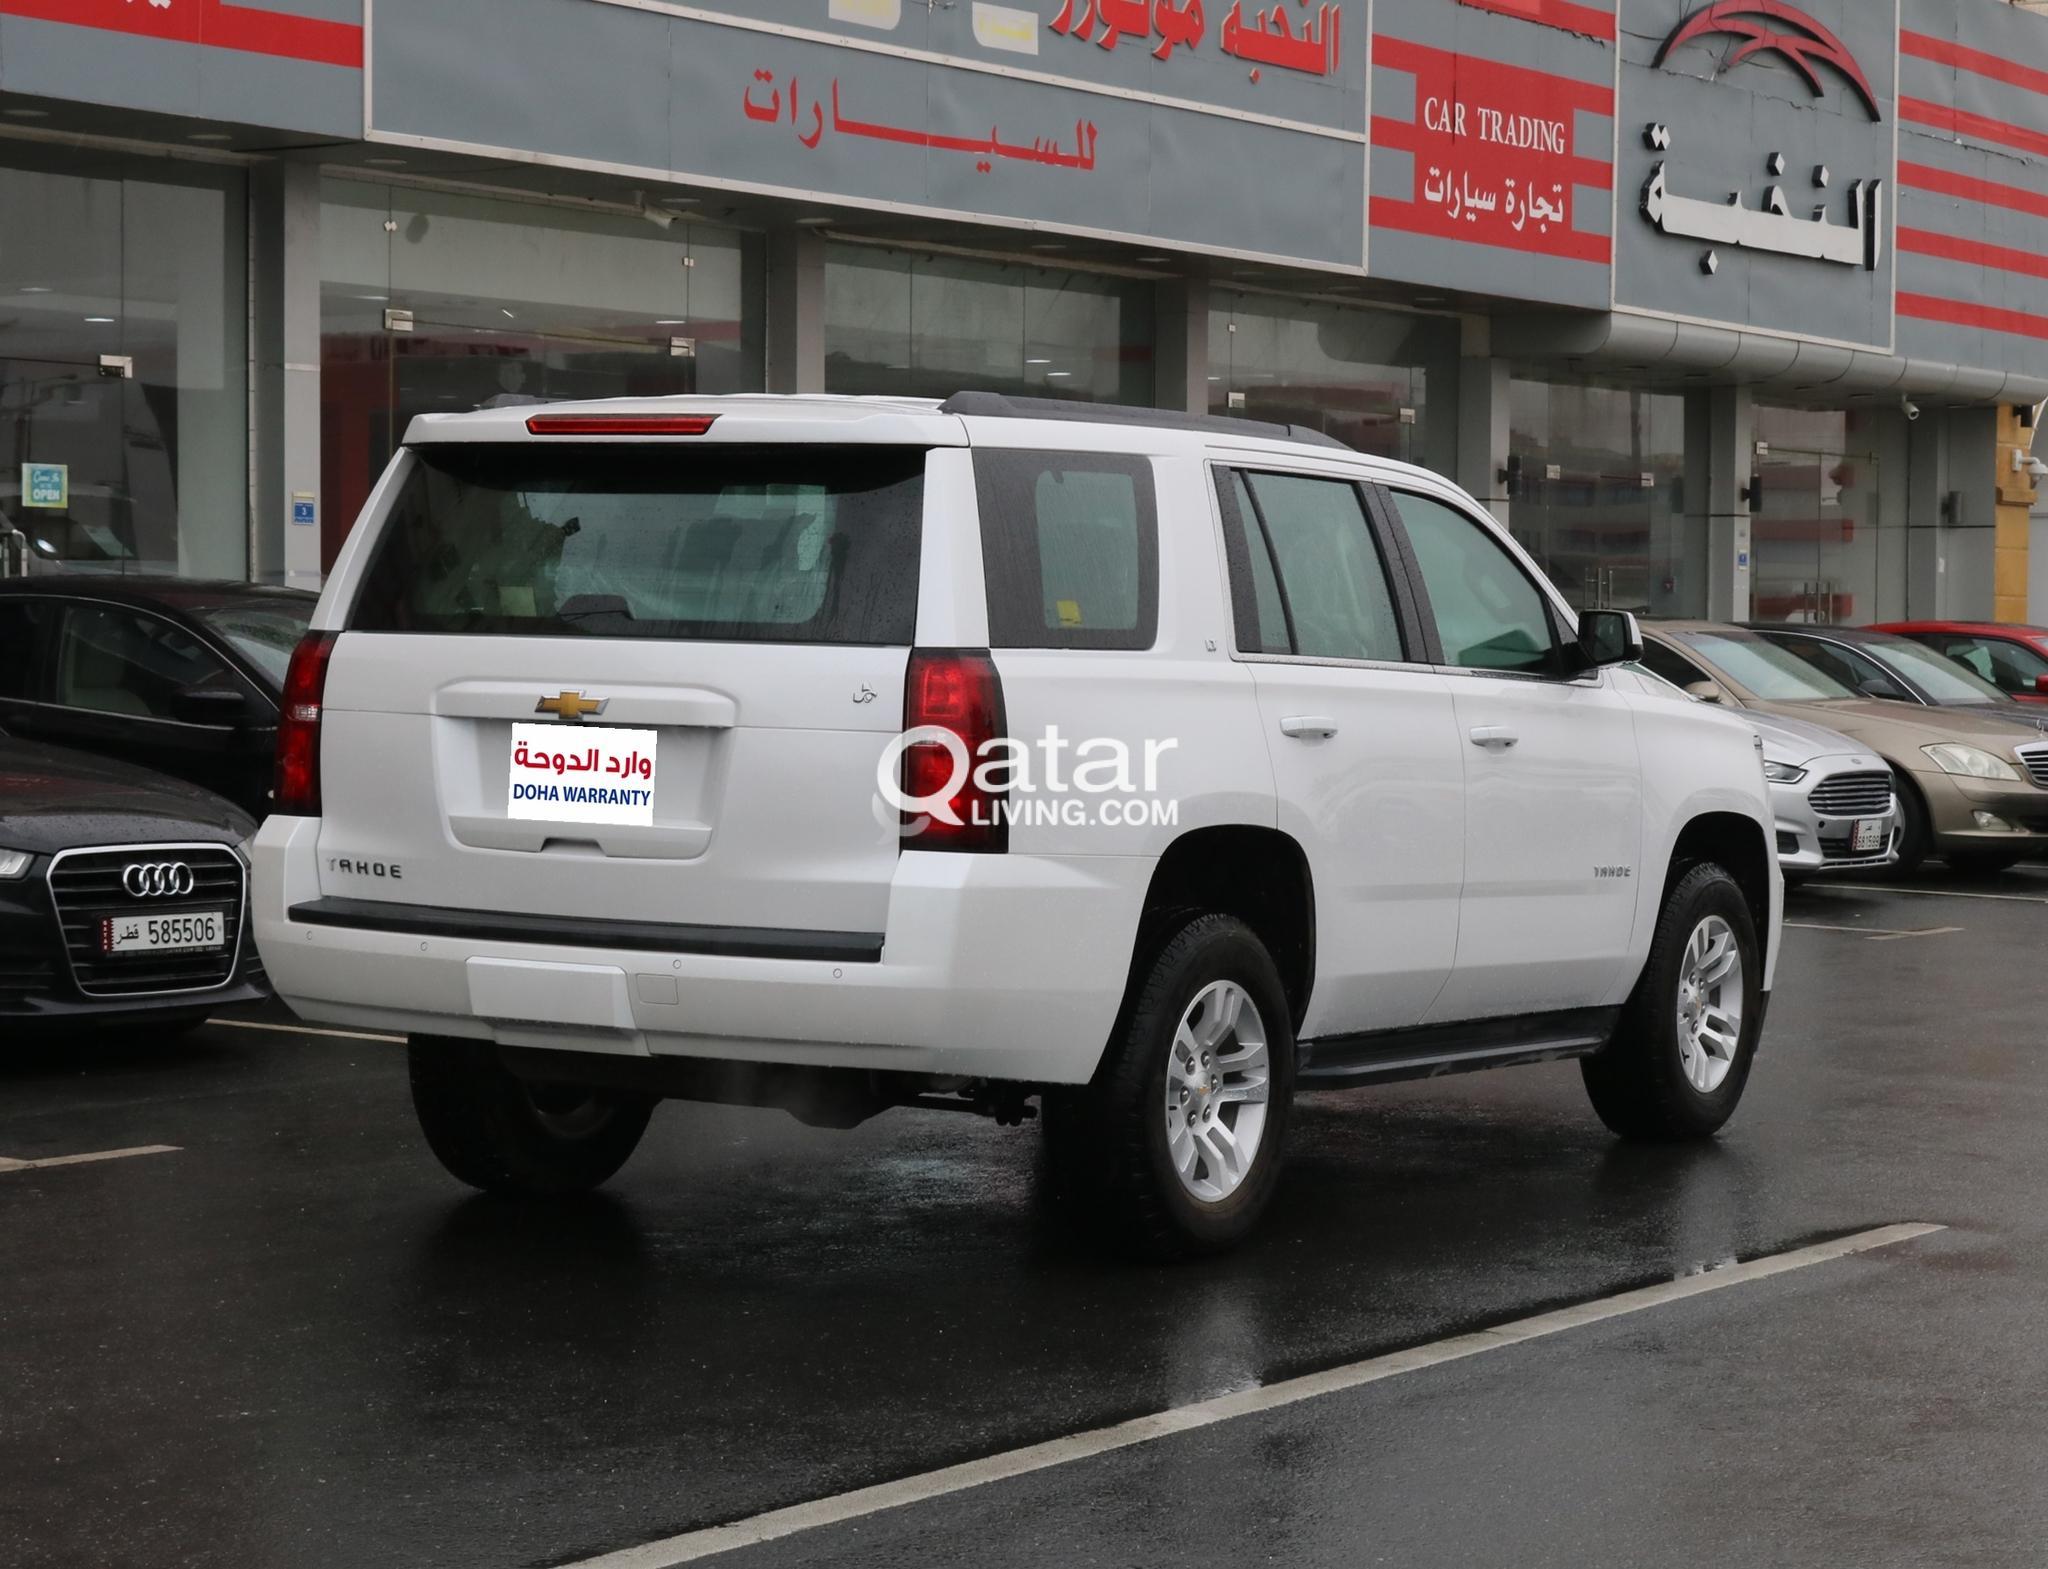 Chevrolet Tahoe LT Model 2018 | Qatar Living